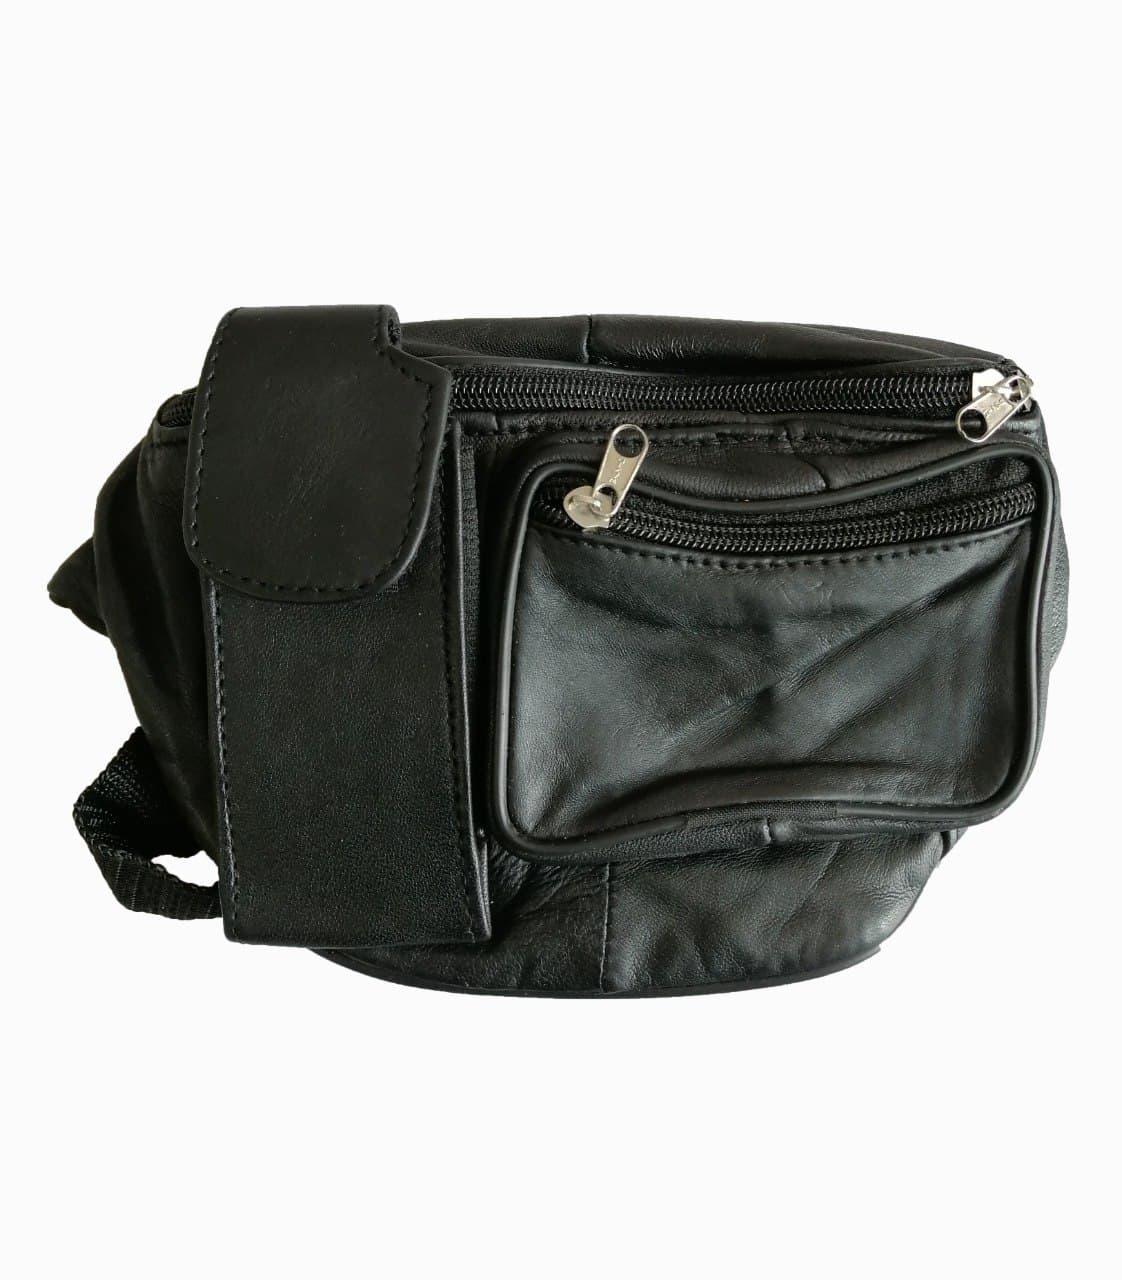 Waist Bag Men Zipper Pockets Travel Bag Phone Pouch Male Casual Bag Durable